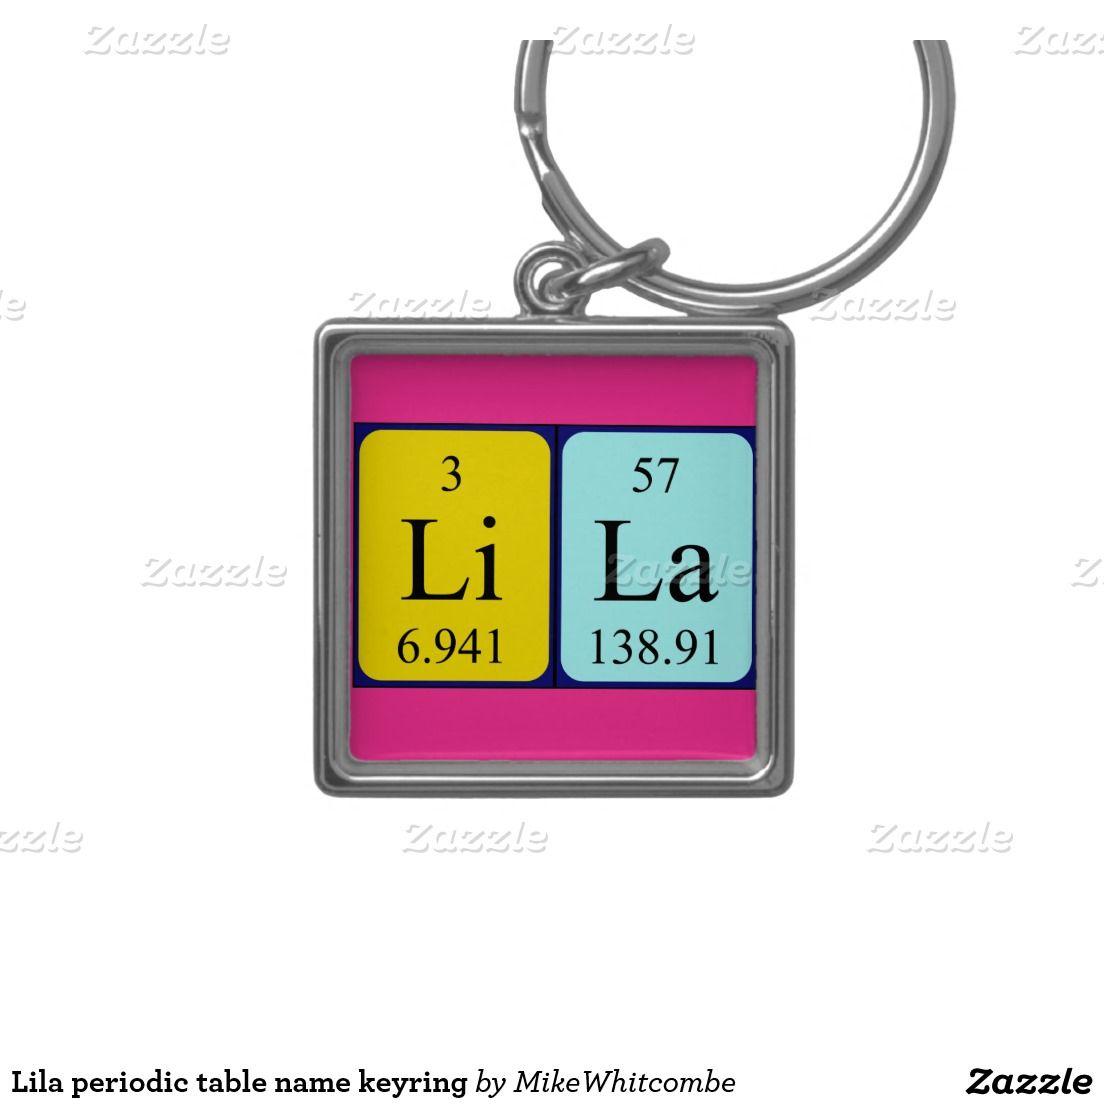 Lila periodic table name keyring silver colored square key ring lila periodic table name keyring silver colored square key ring urtaz Images